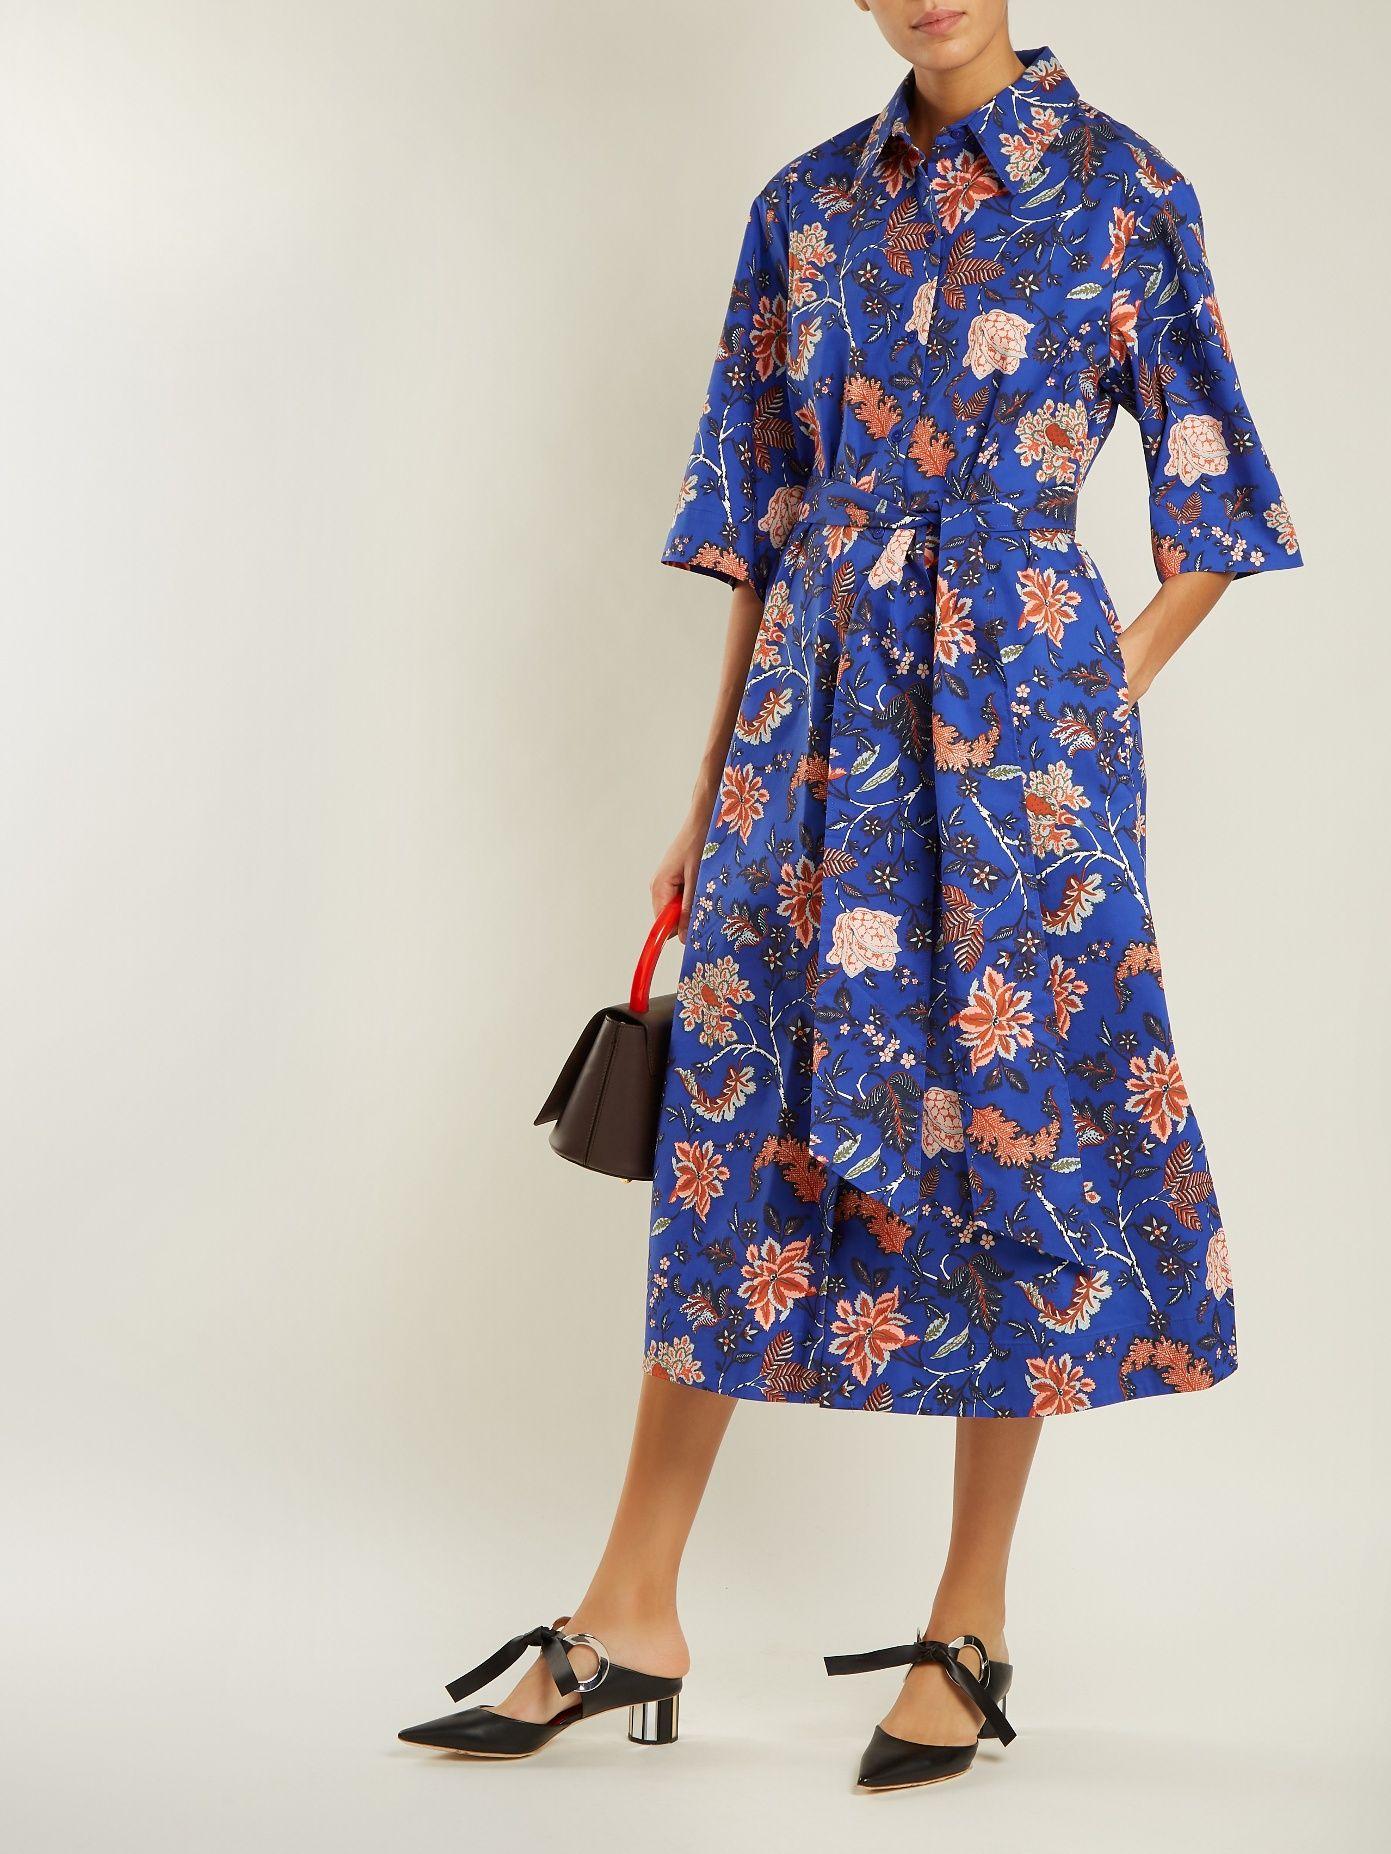 23d4007dfd04f6 Click here to buy Diane Von Furstenberg Canton-print stretch-cotton dress  at MATCHESFASHION.COM